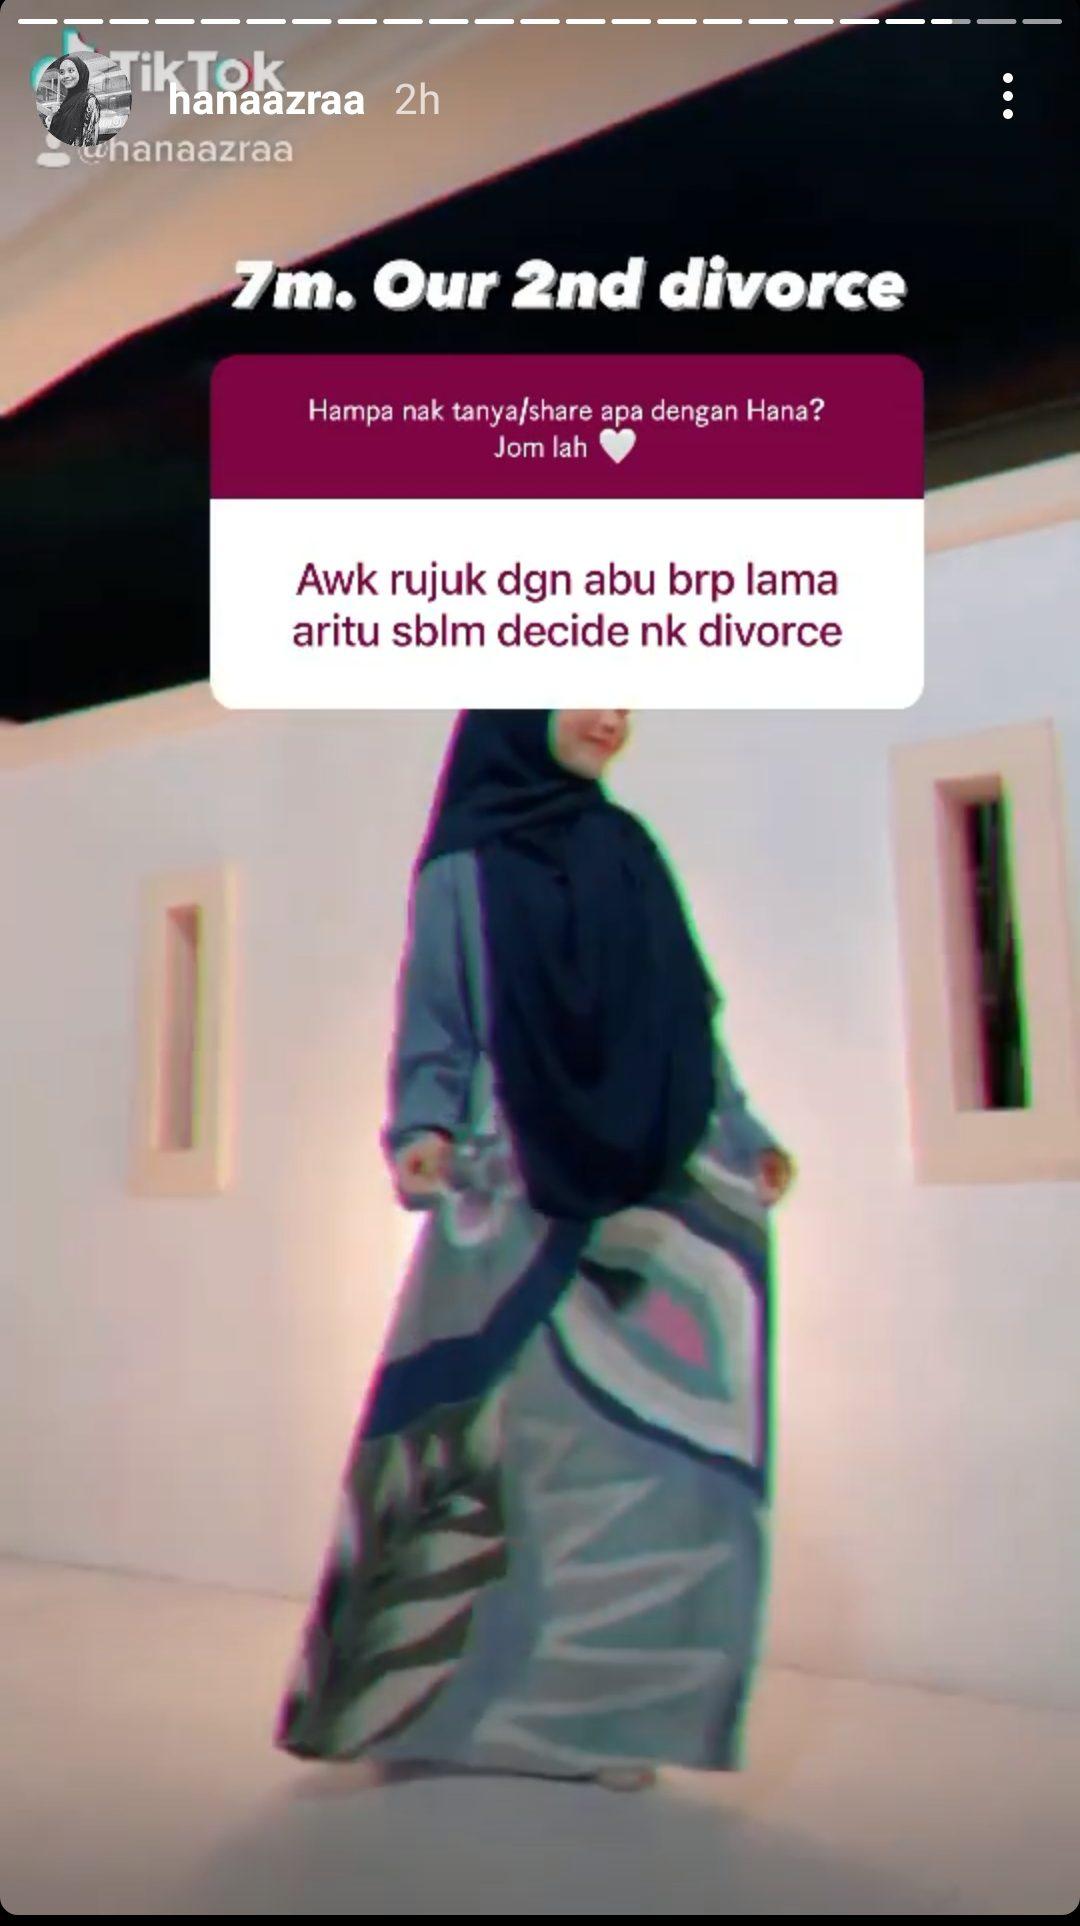 pu abu dan hana azraa bercerai